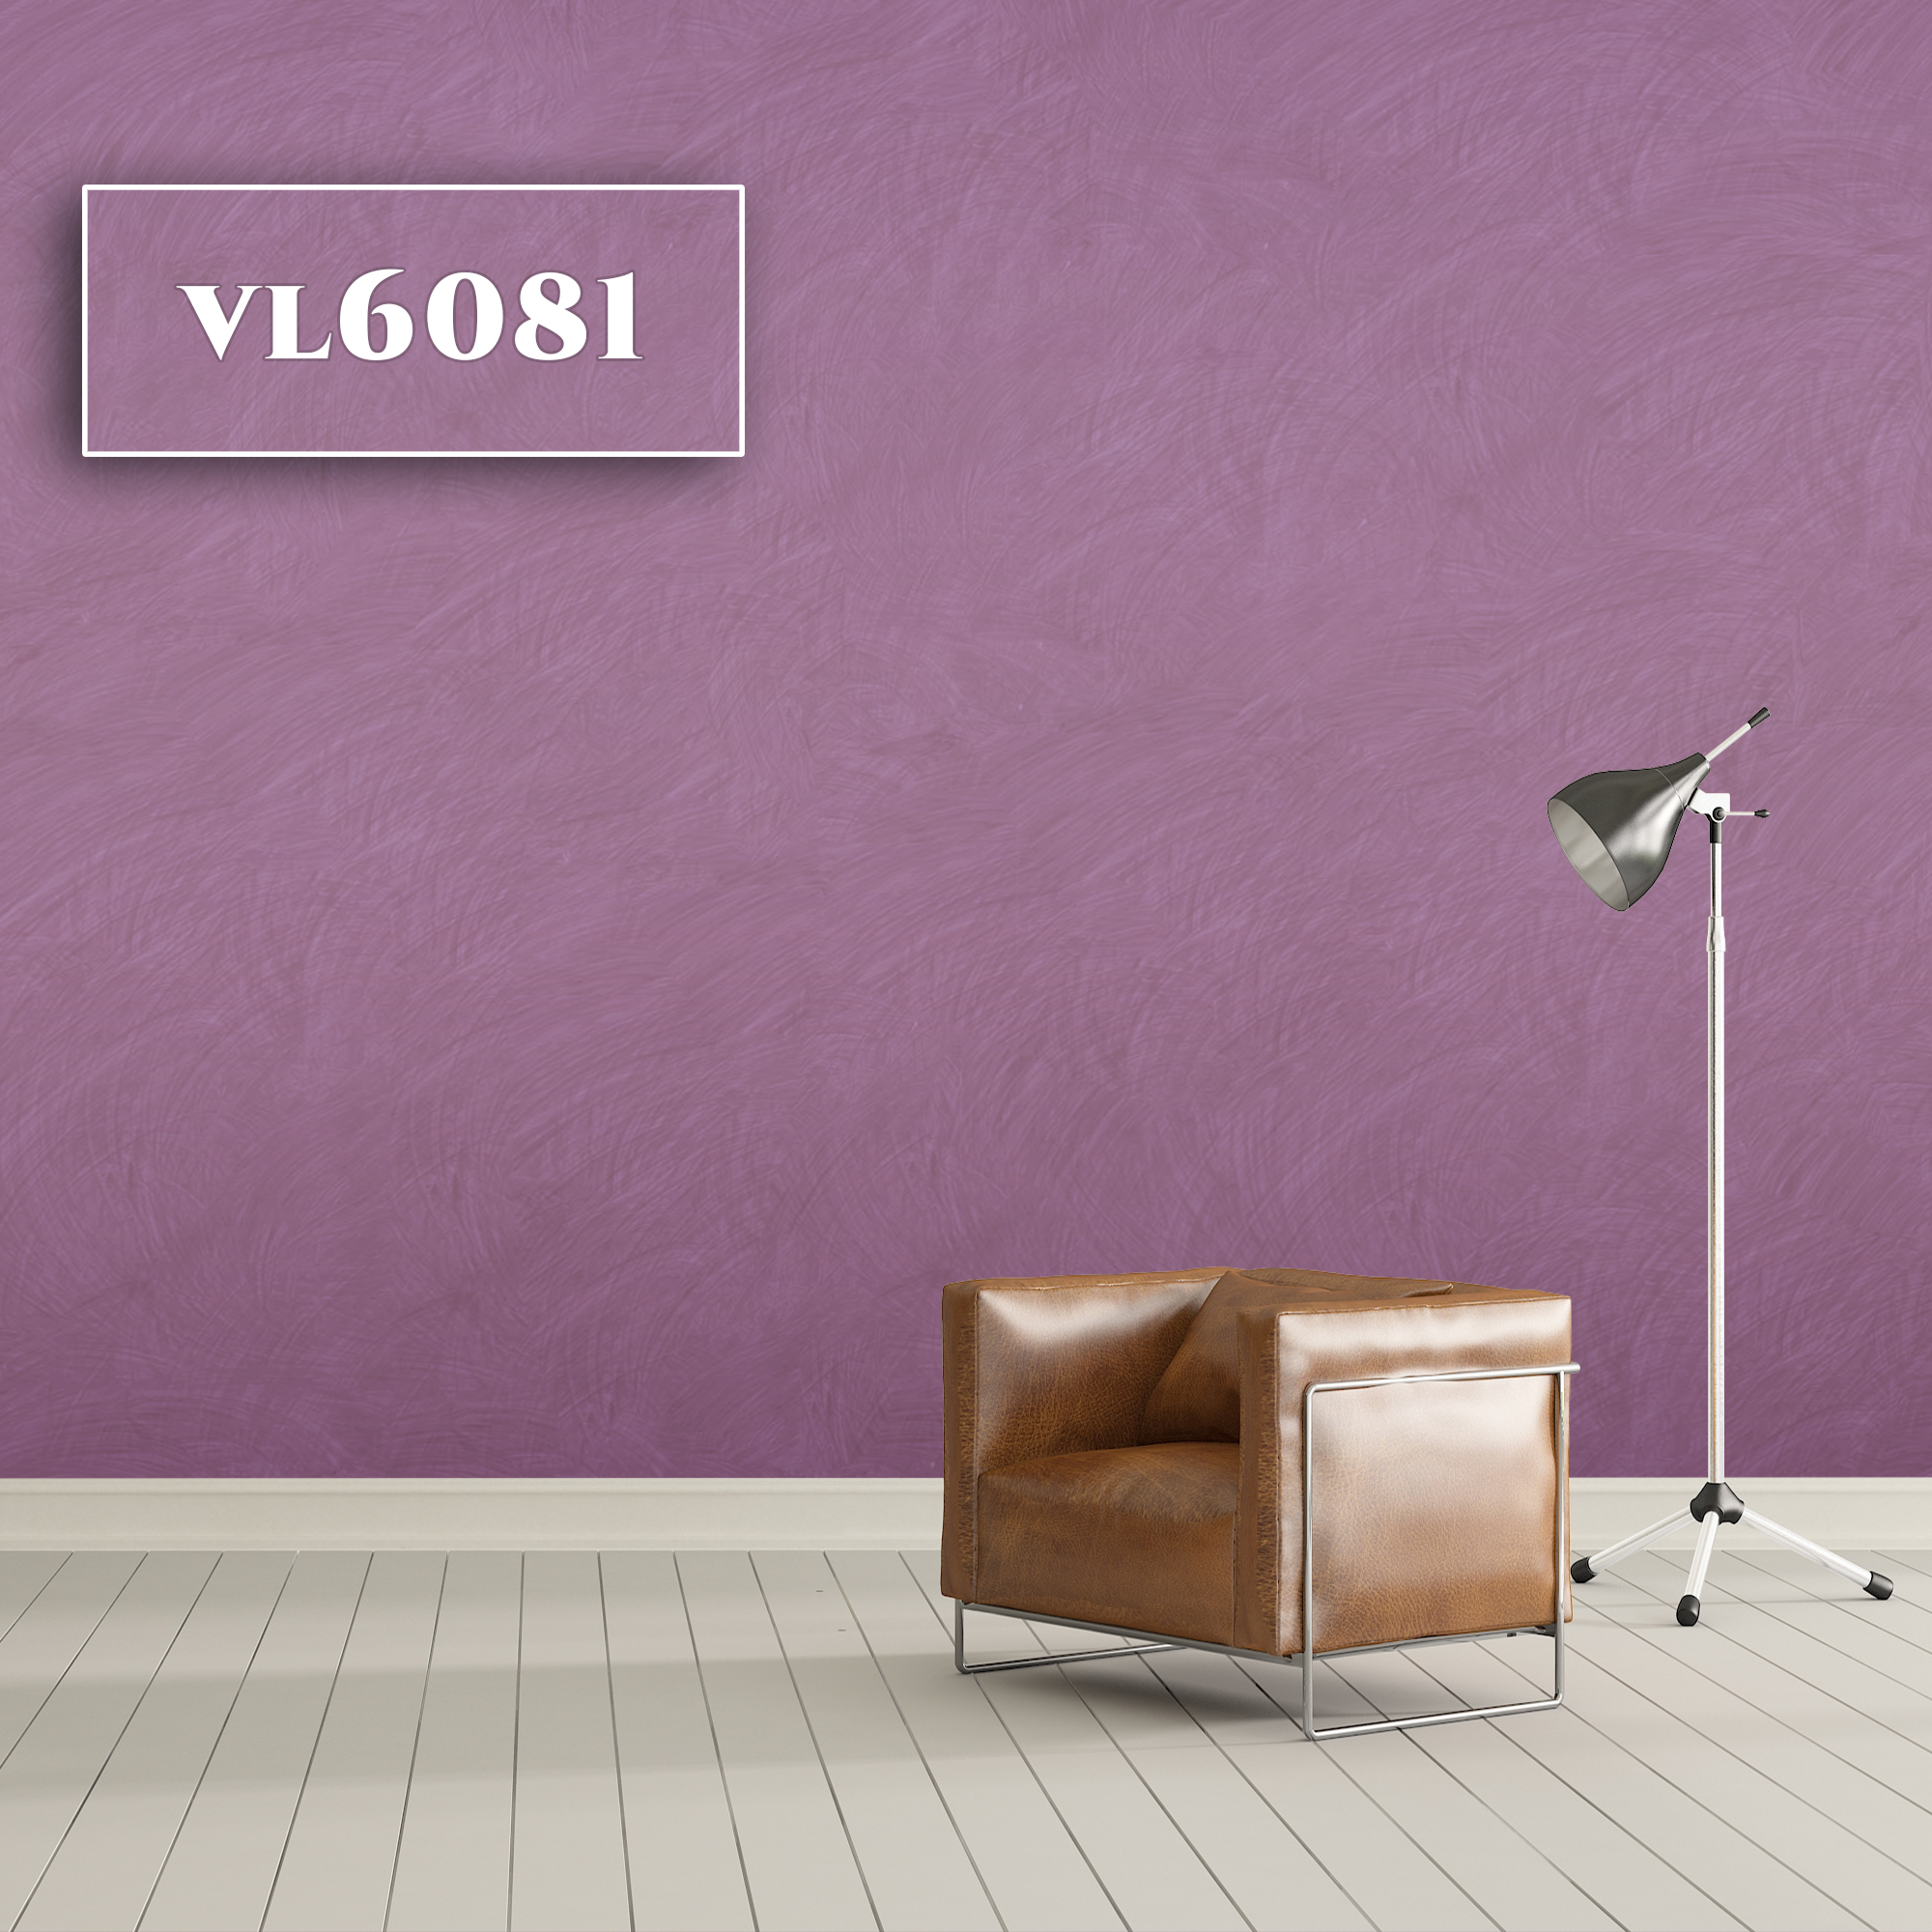 VL6081